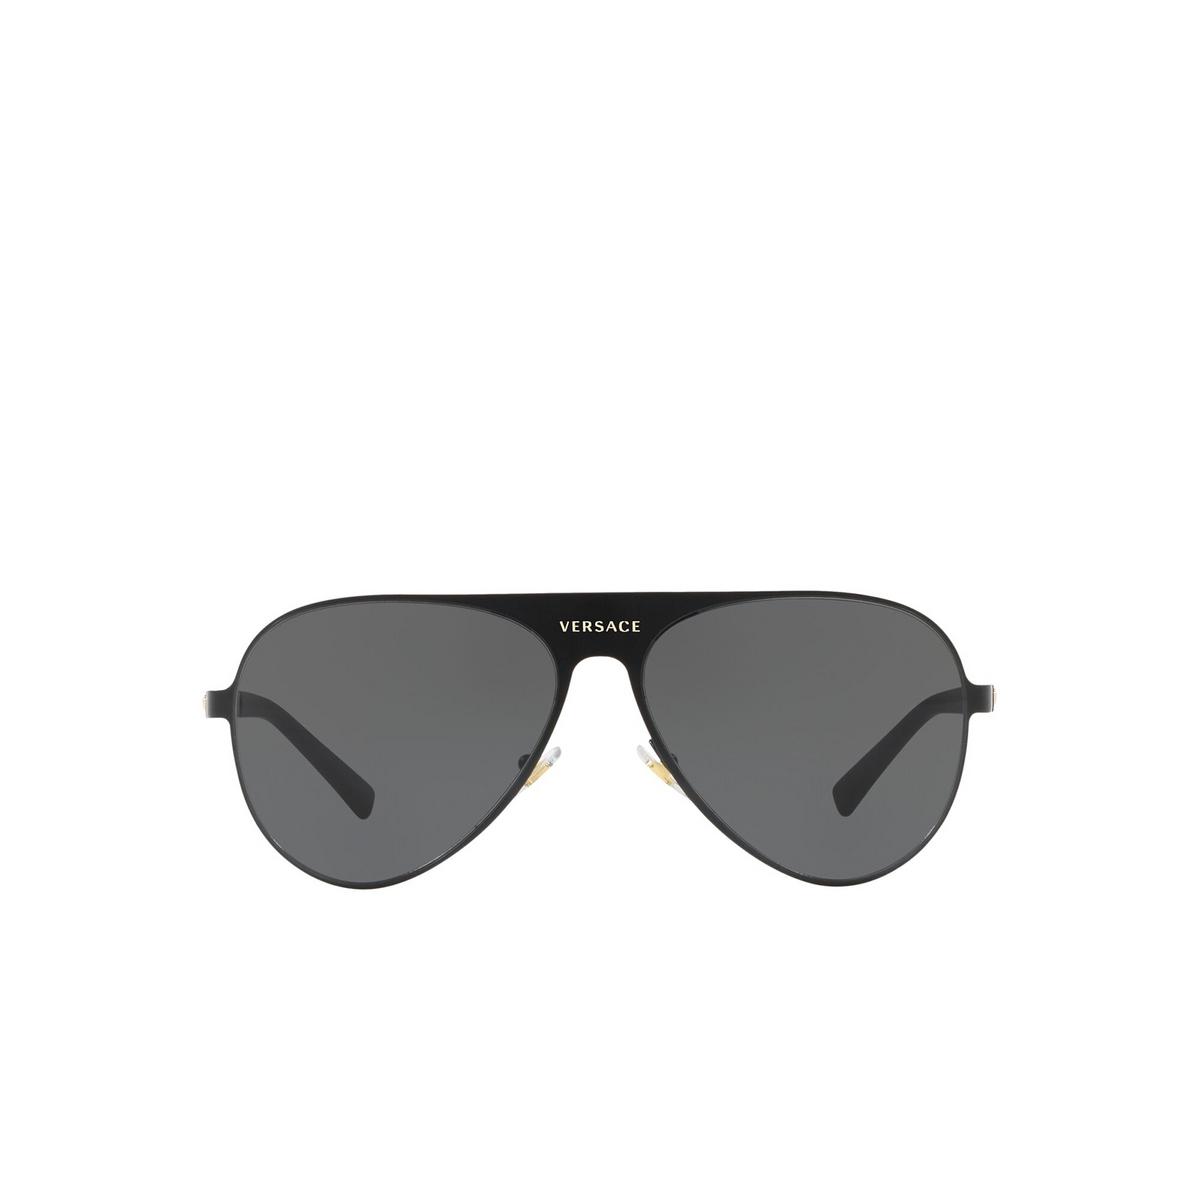 Versace® Aviator Sunglasses: VE2189 color Matte Black 142587 - front view.